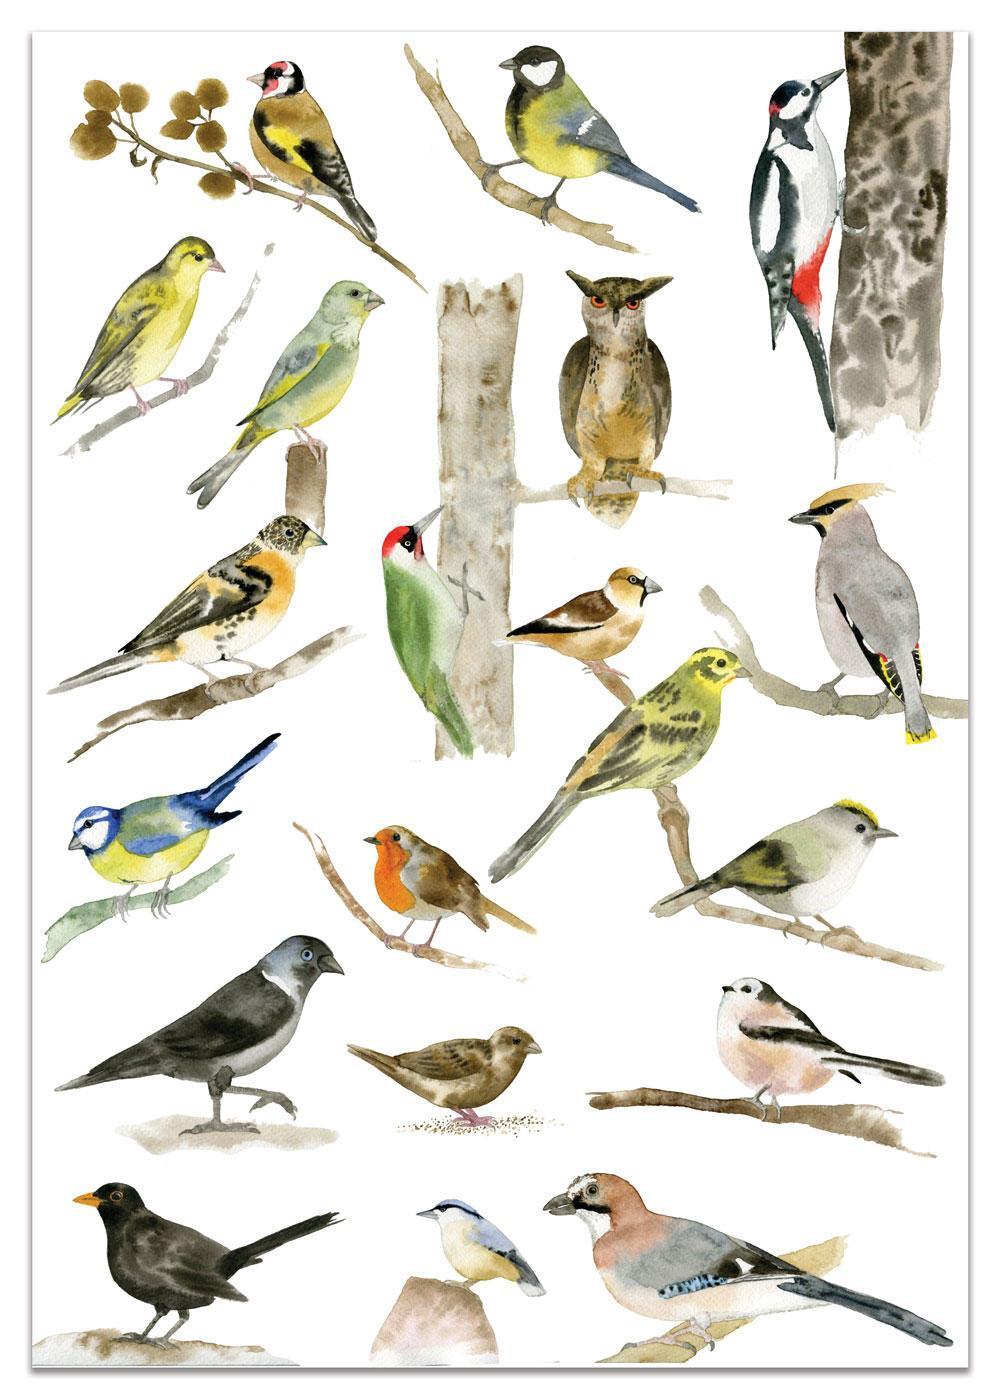 MANKAI Paper Plakát s ptáčky A3 Birds, multi barva, papír